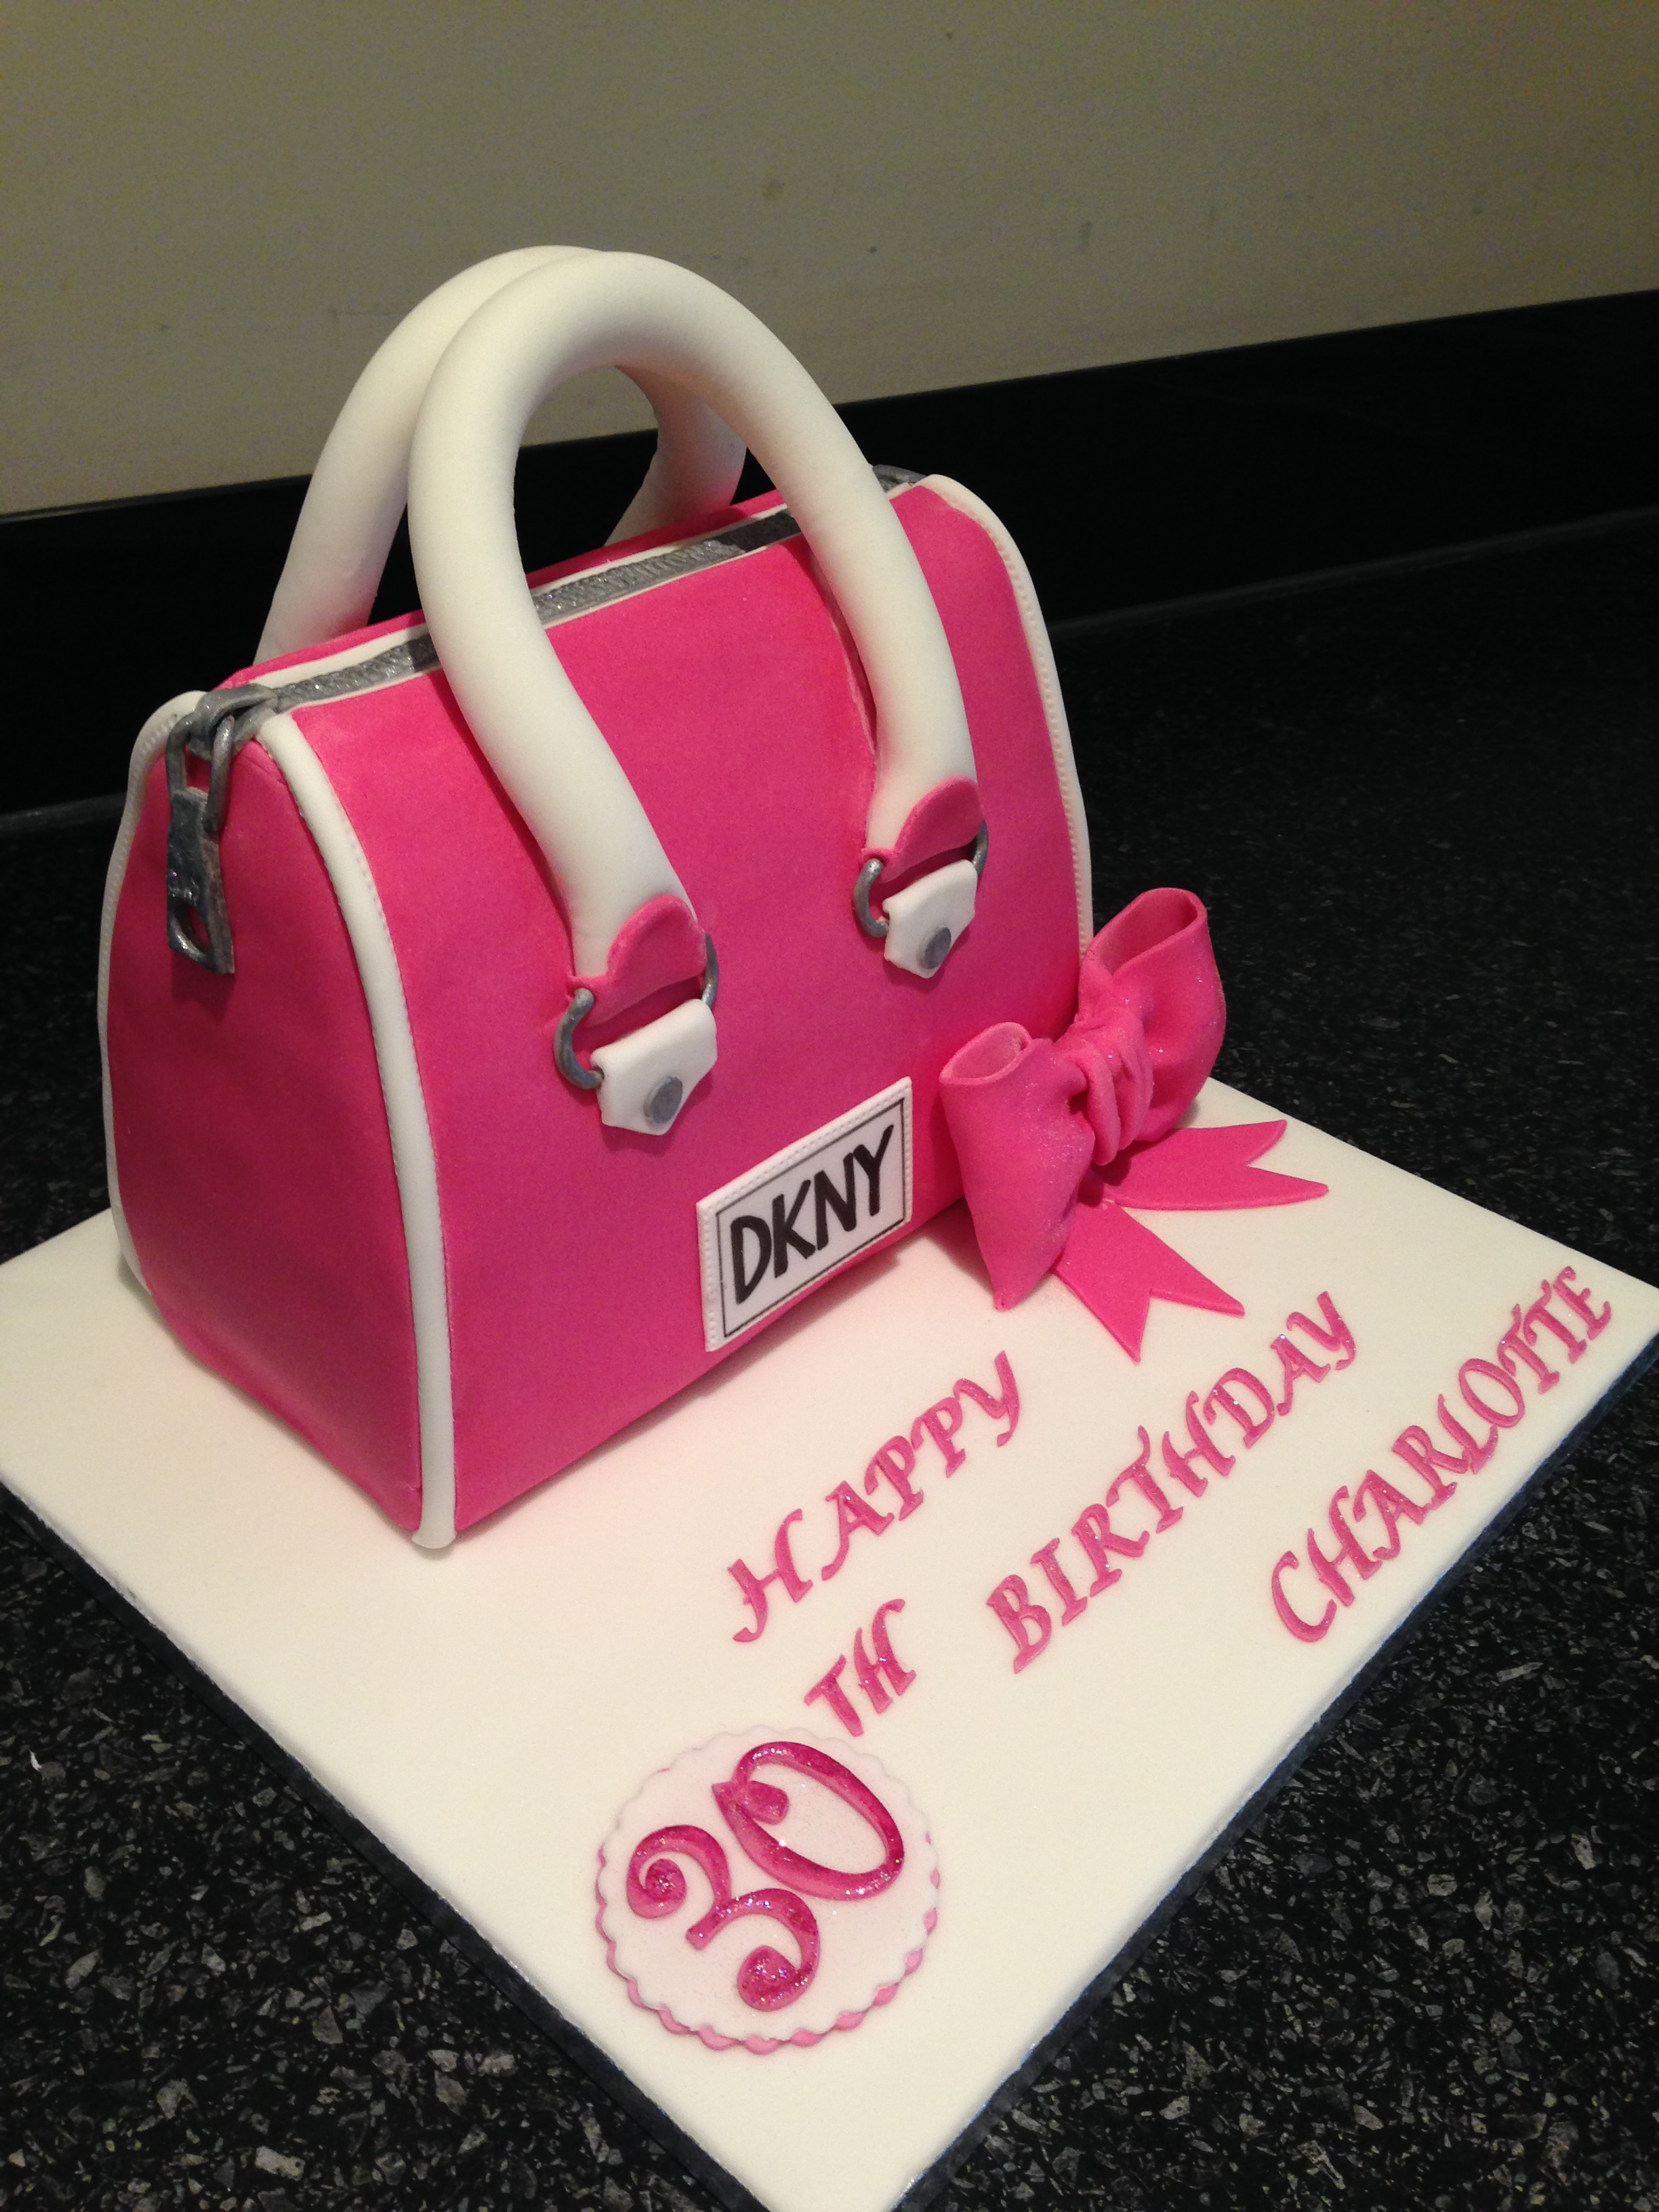 Handbag Cakes Images Dkny Handbag Cake